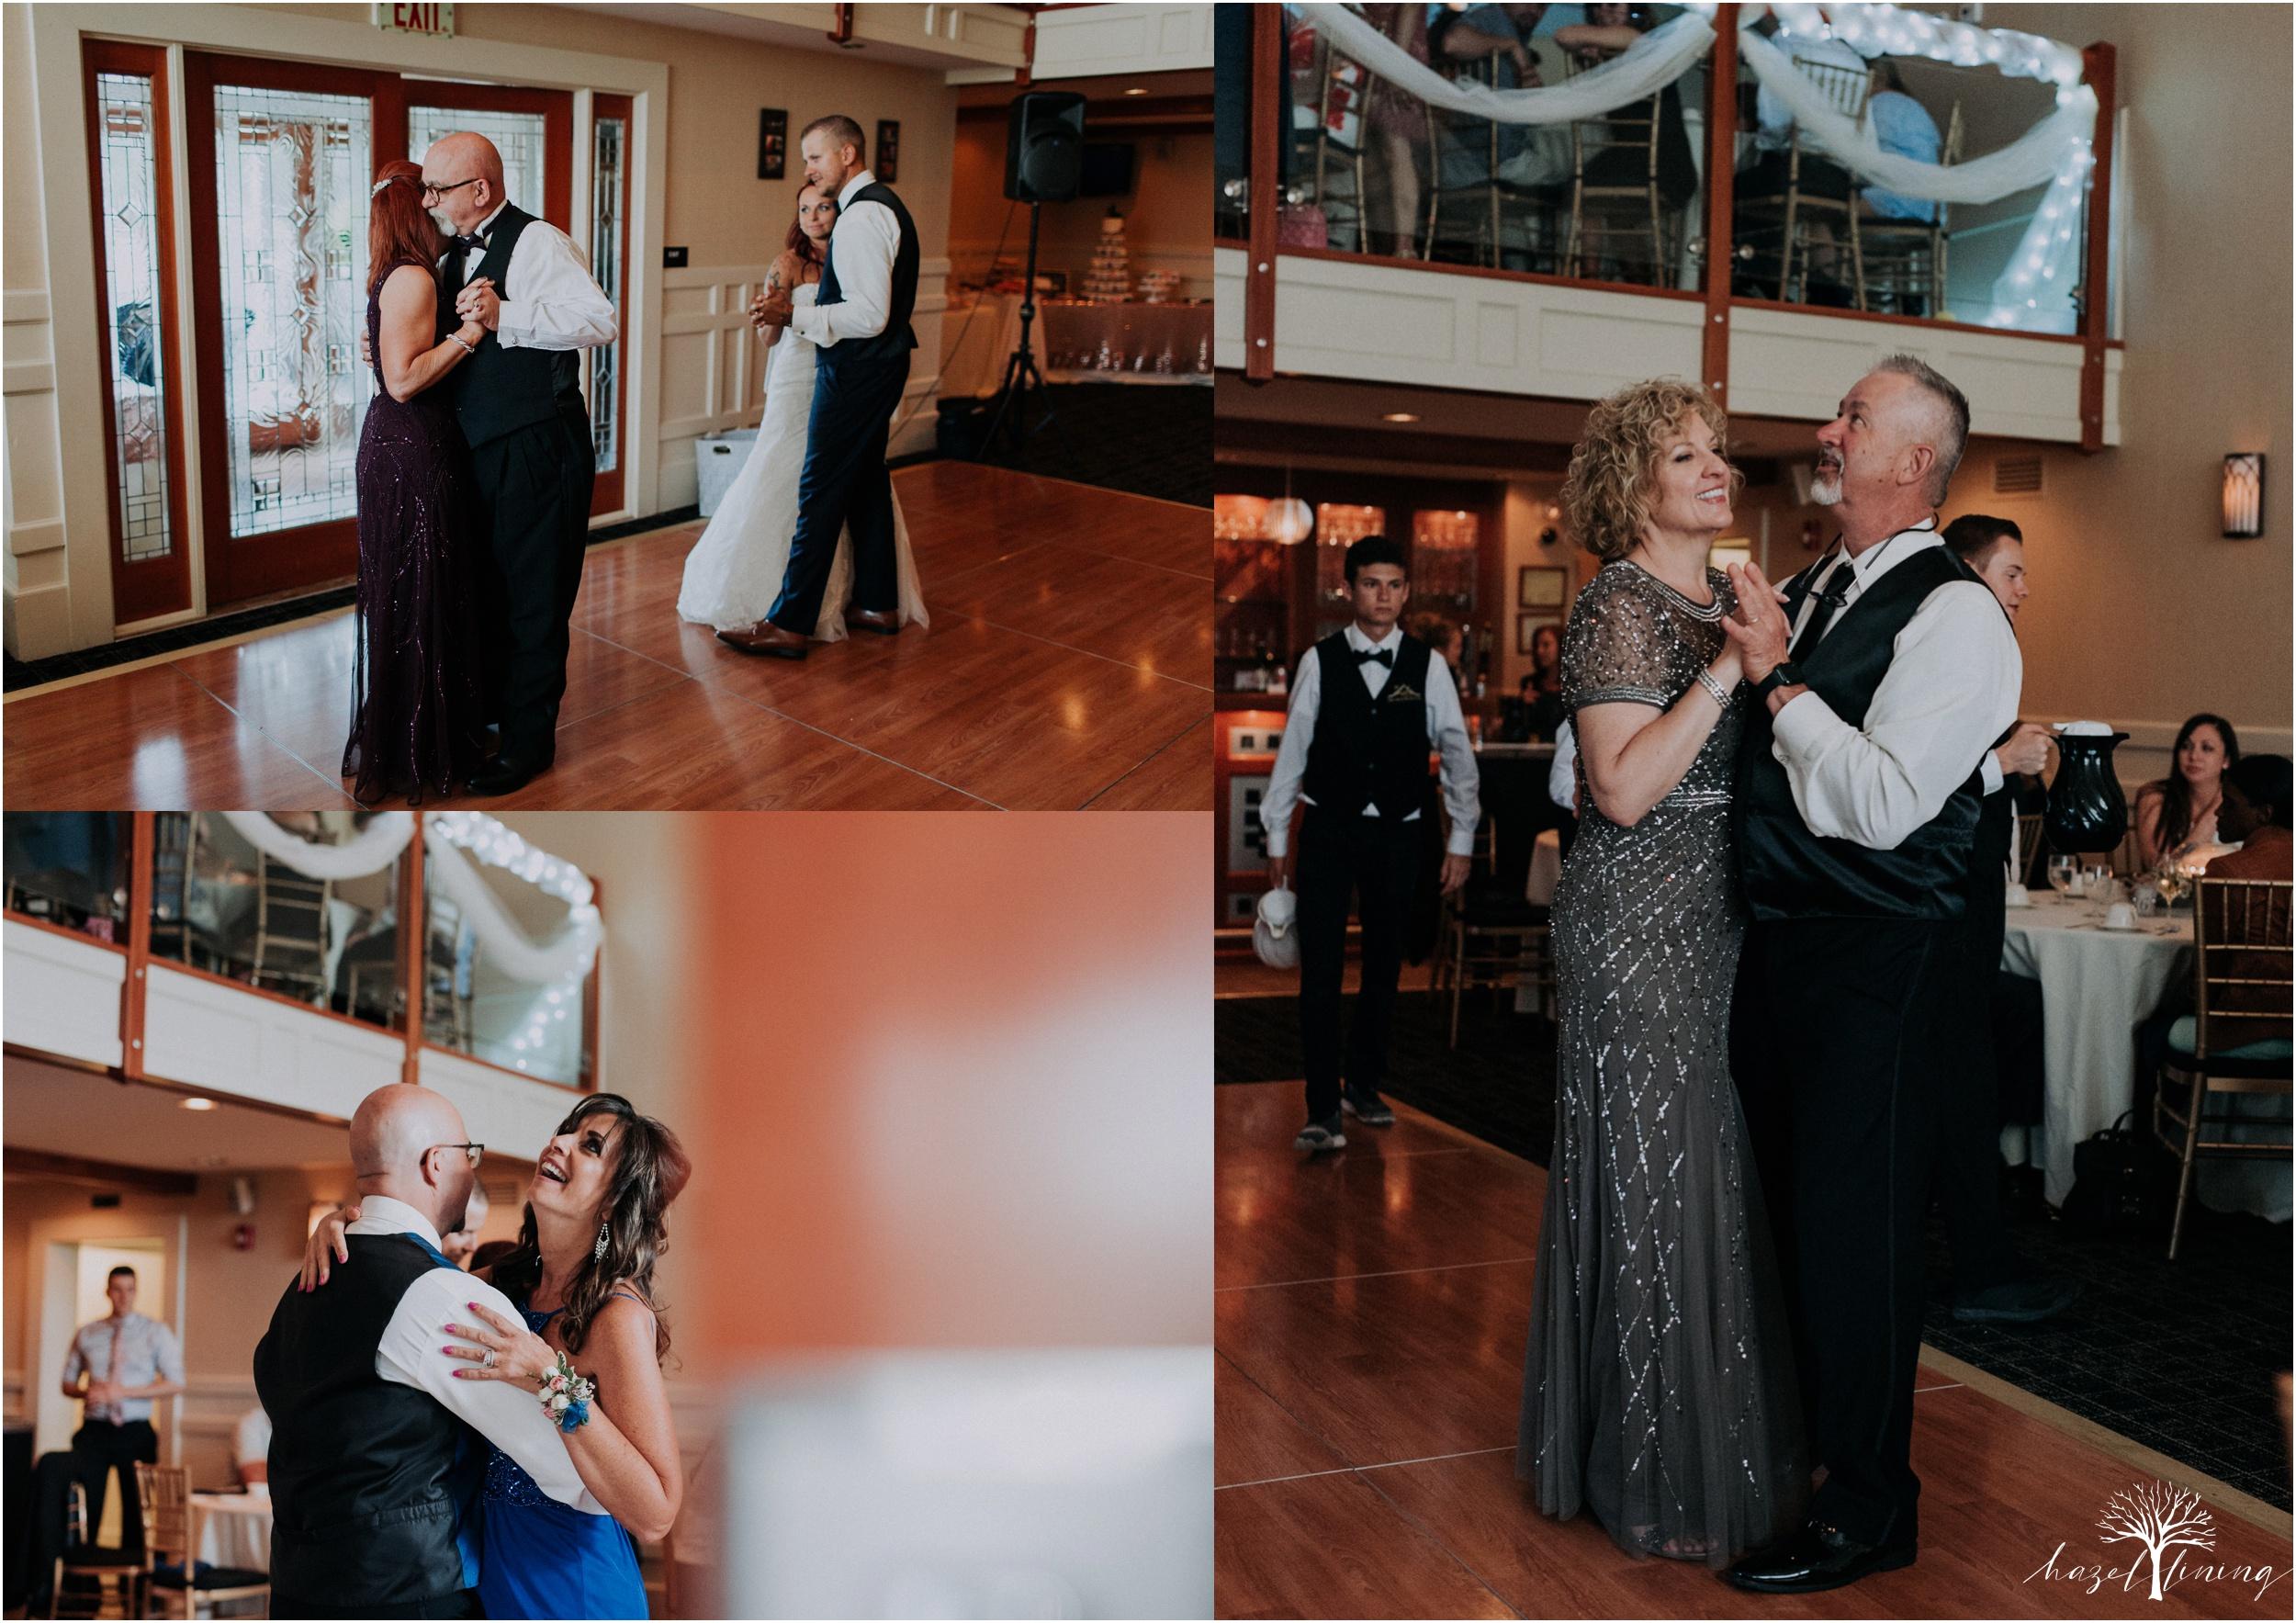 alyssa-james-stiteler-wedding-loft-and-sweet-water-cc-pennsburg-pennsylvania-hazel-lining-travel-wedding-elopement-photography_0129.jpg